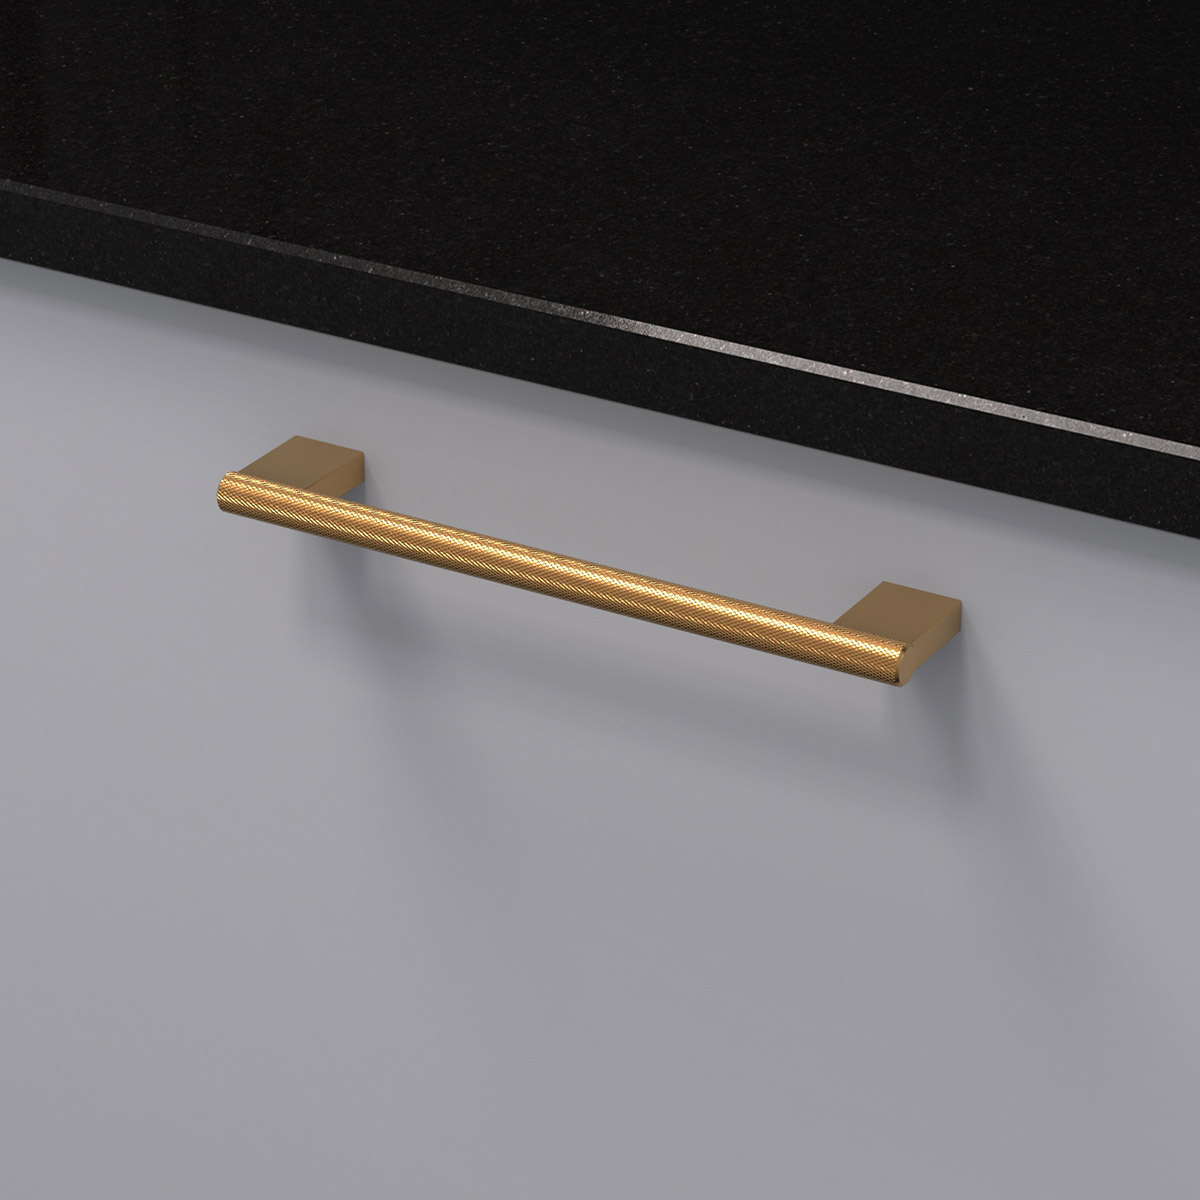 Handtag graf mini massing 370230 11 cc 160 mm ncs s 3000 n granit svart